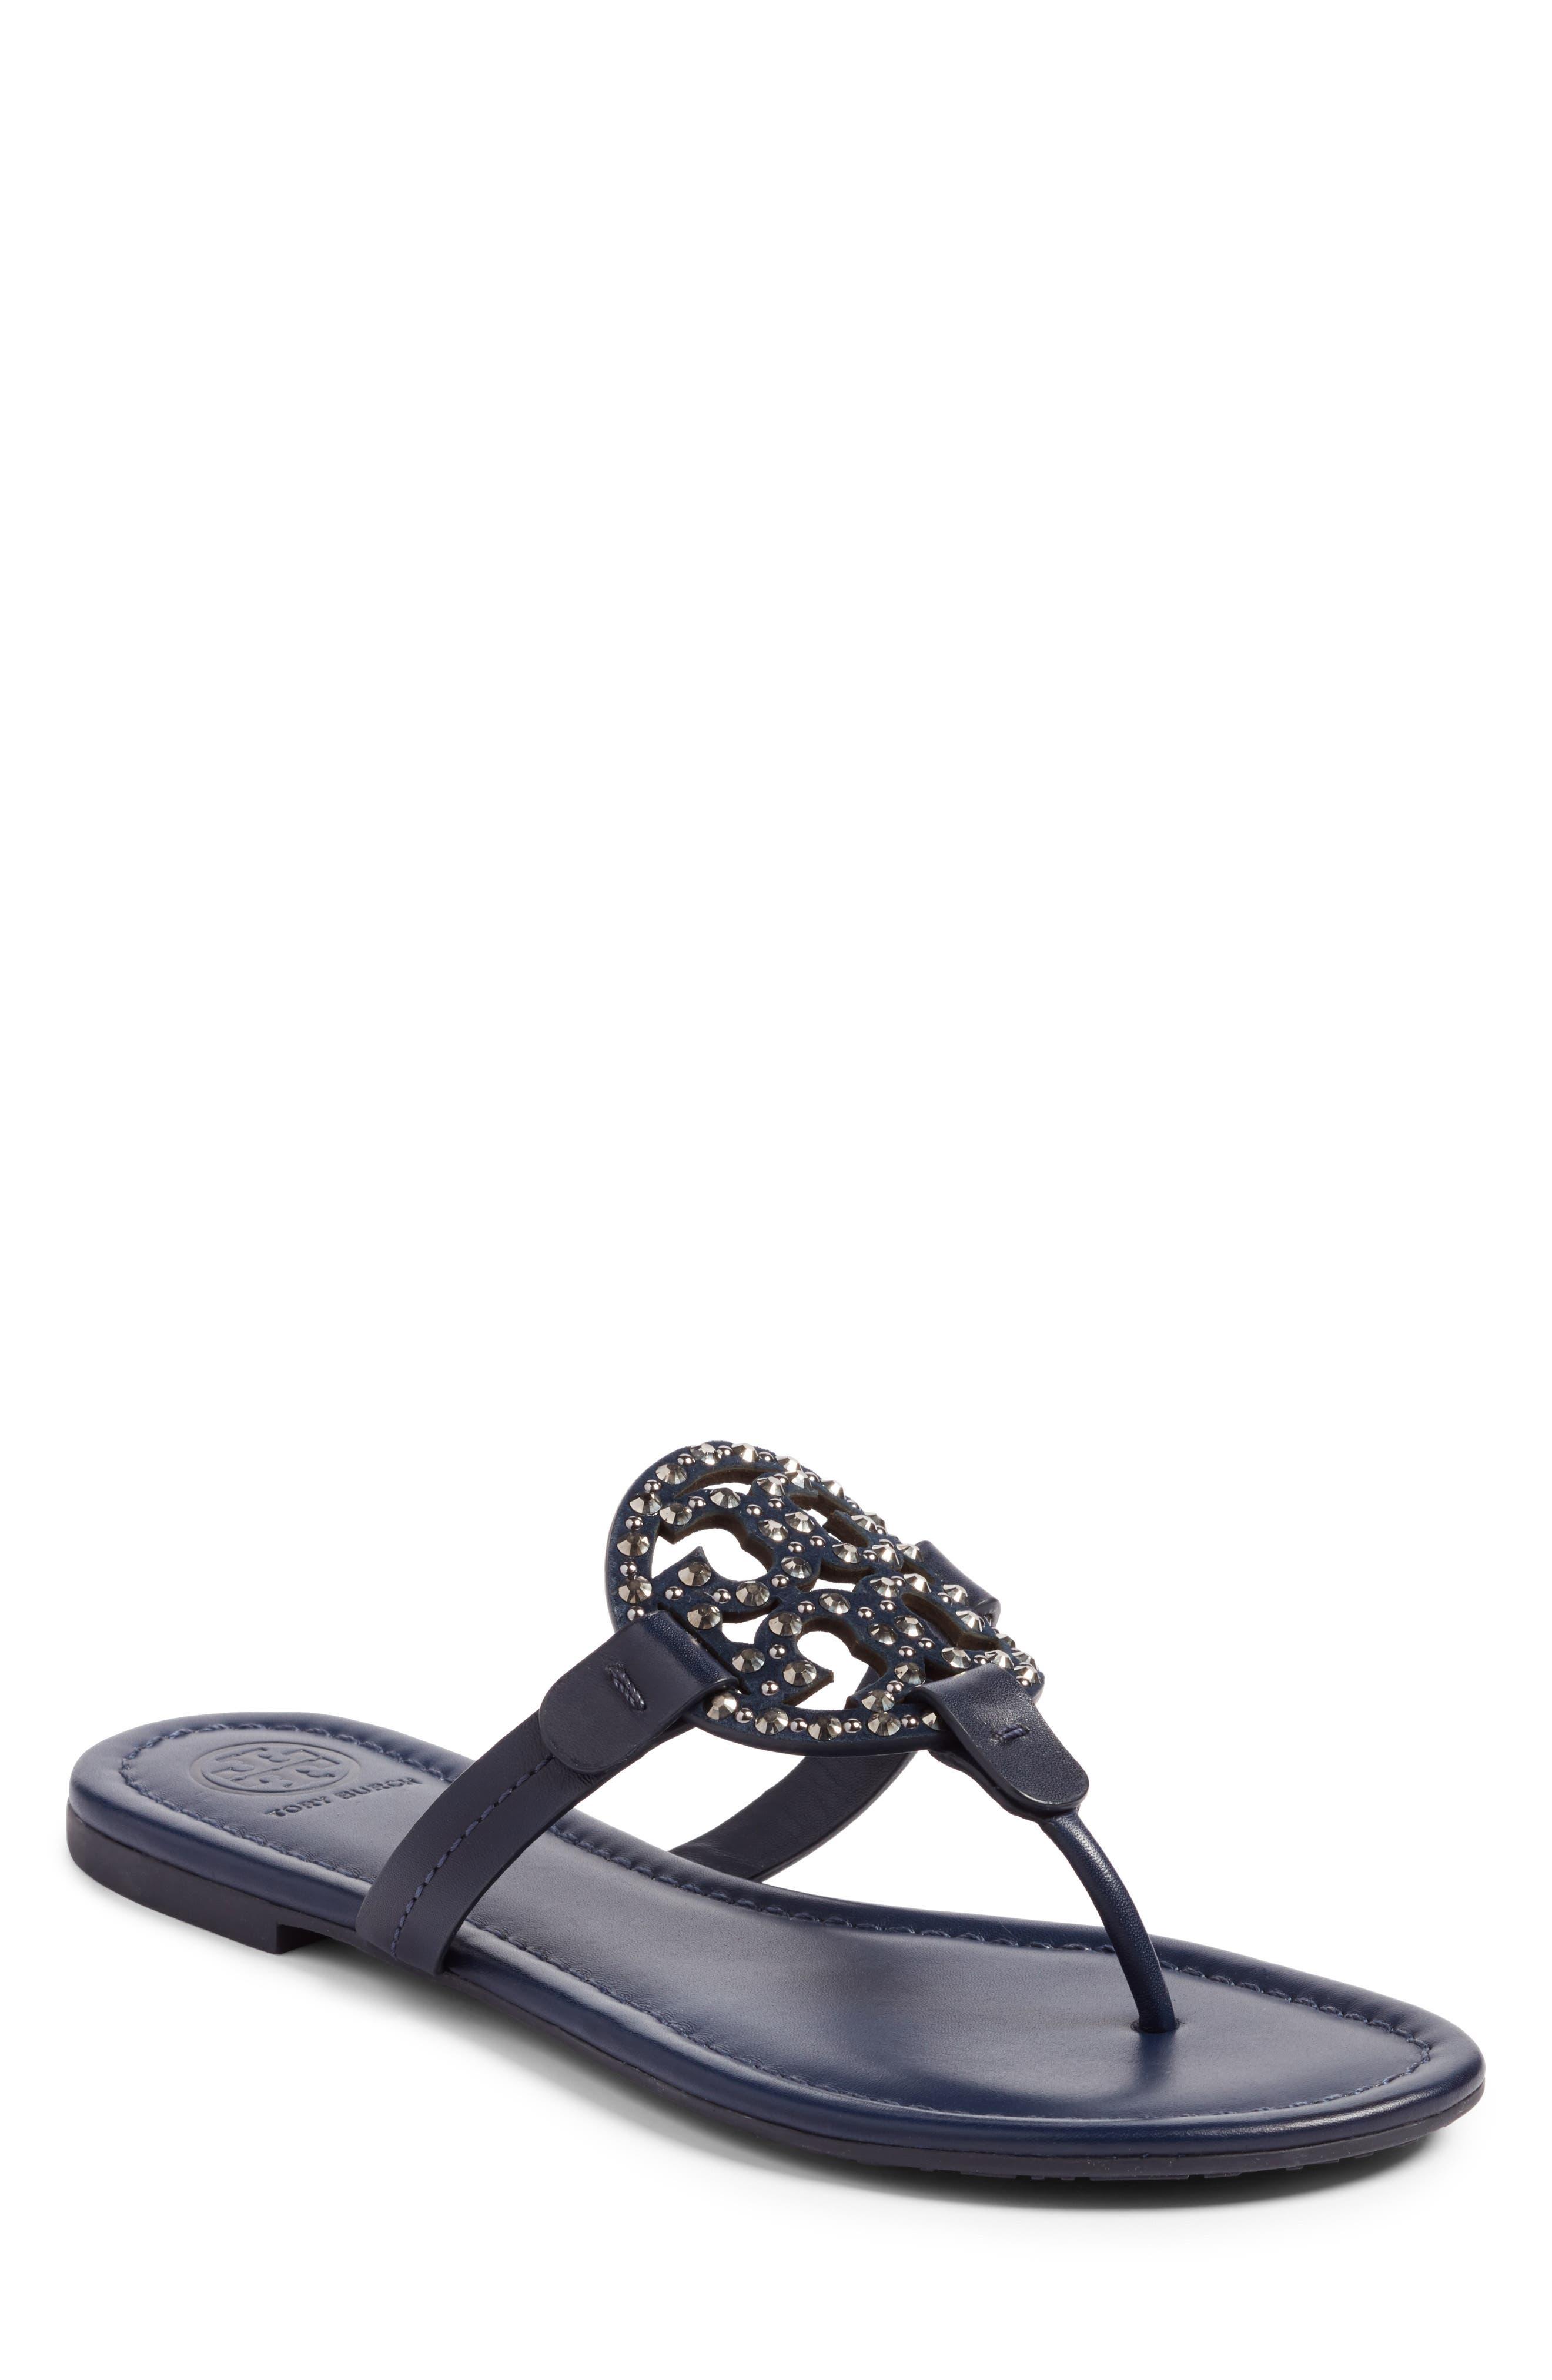 Tory Burch Miller Embellished Sandal (Women)